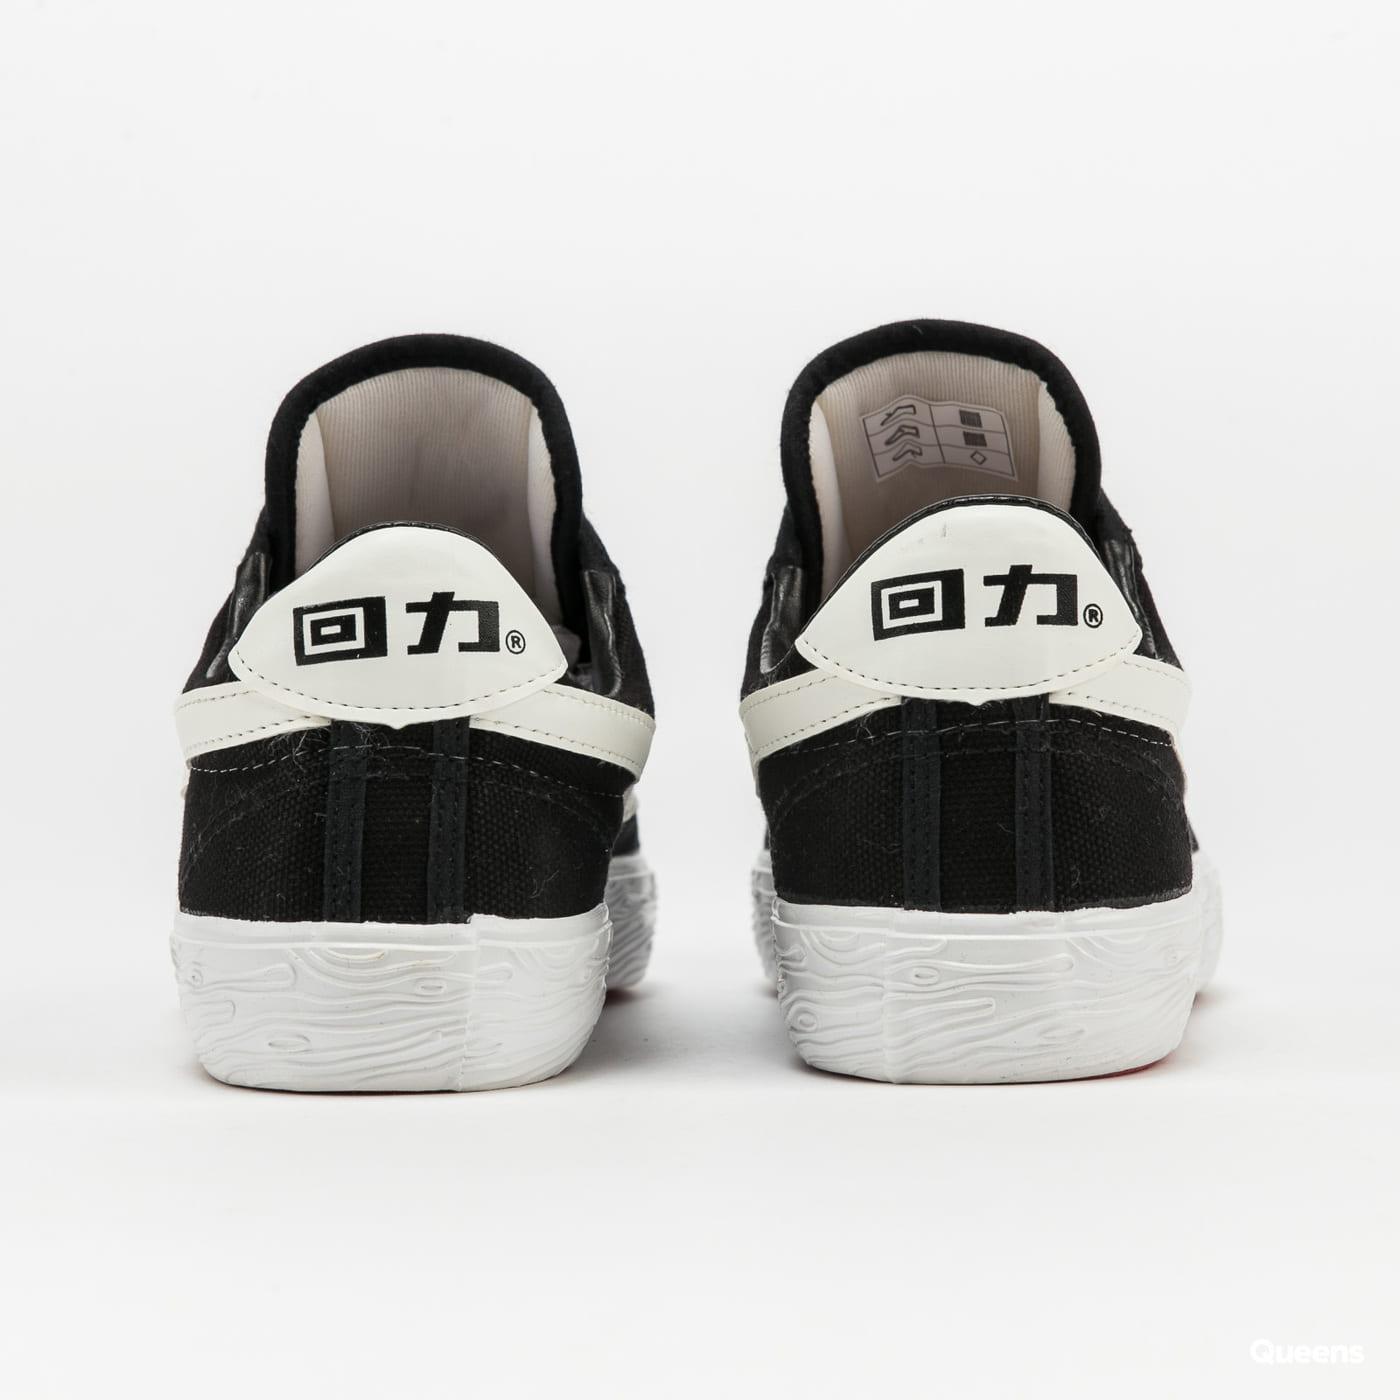 Warrior Shanghai WB-1 black / white